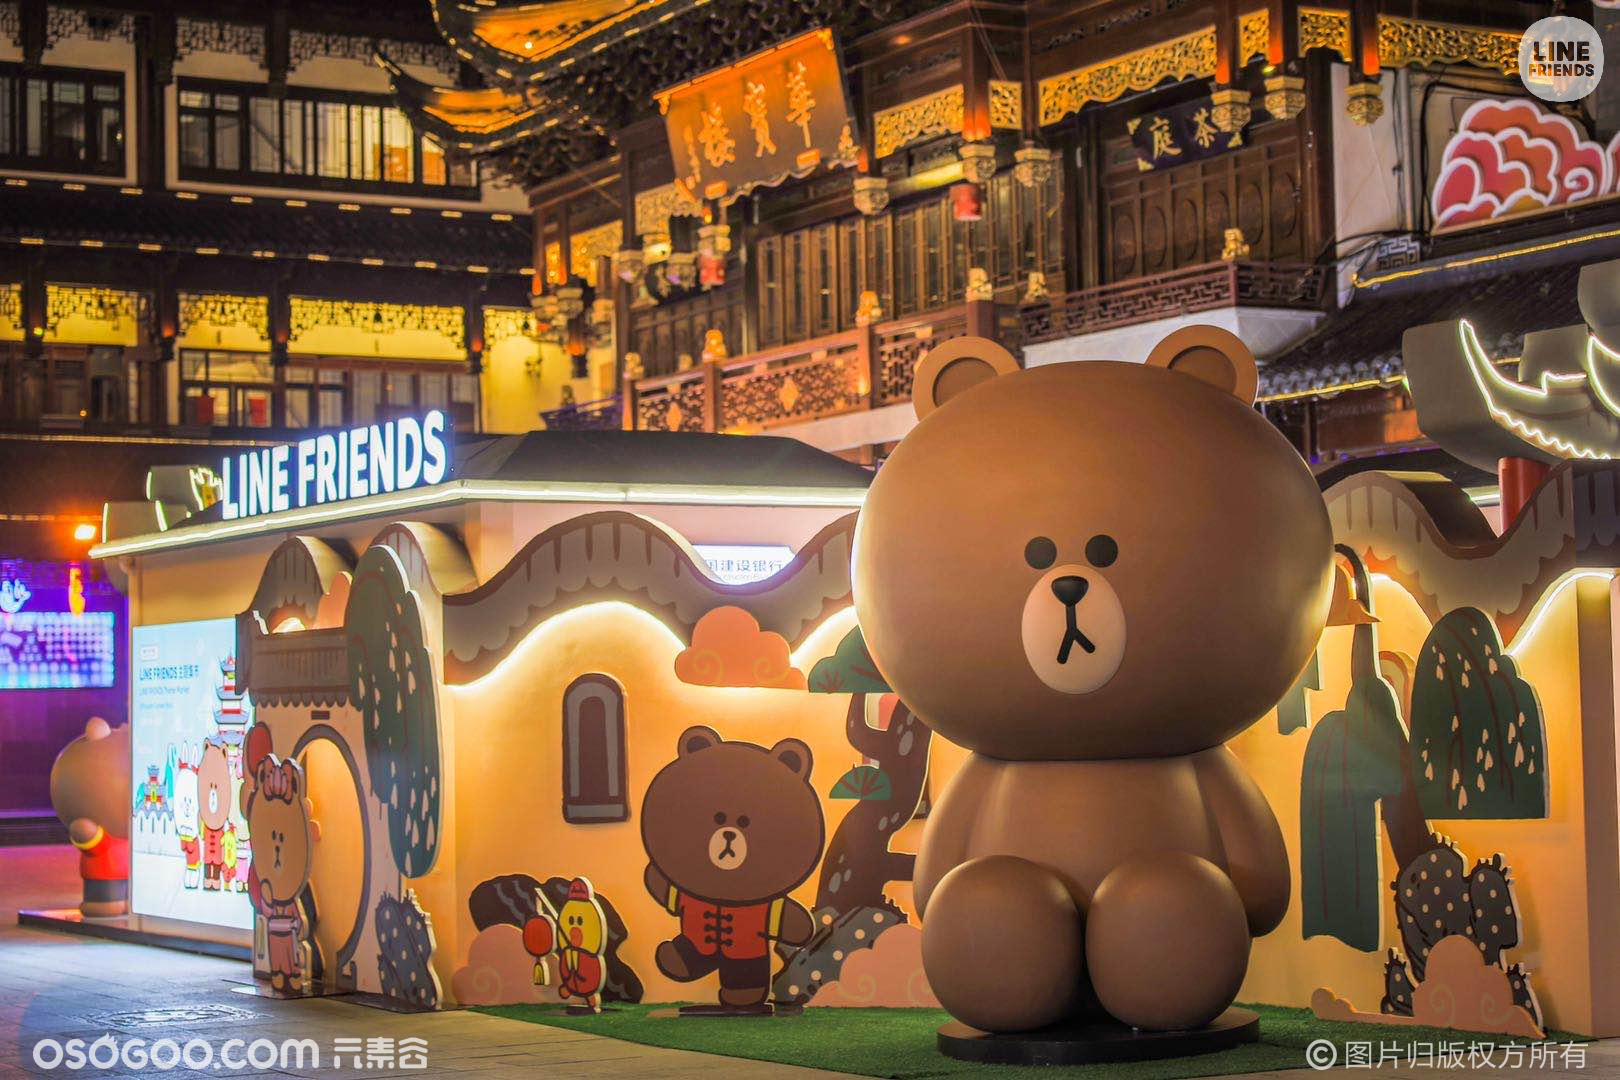 LINE FRIENDS携手豫园商城 举办七夕情人节庙会活动